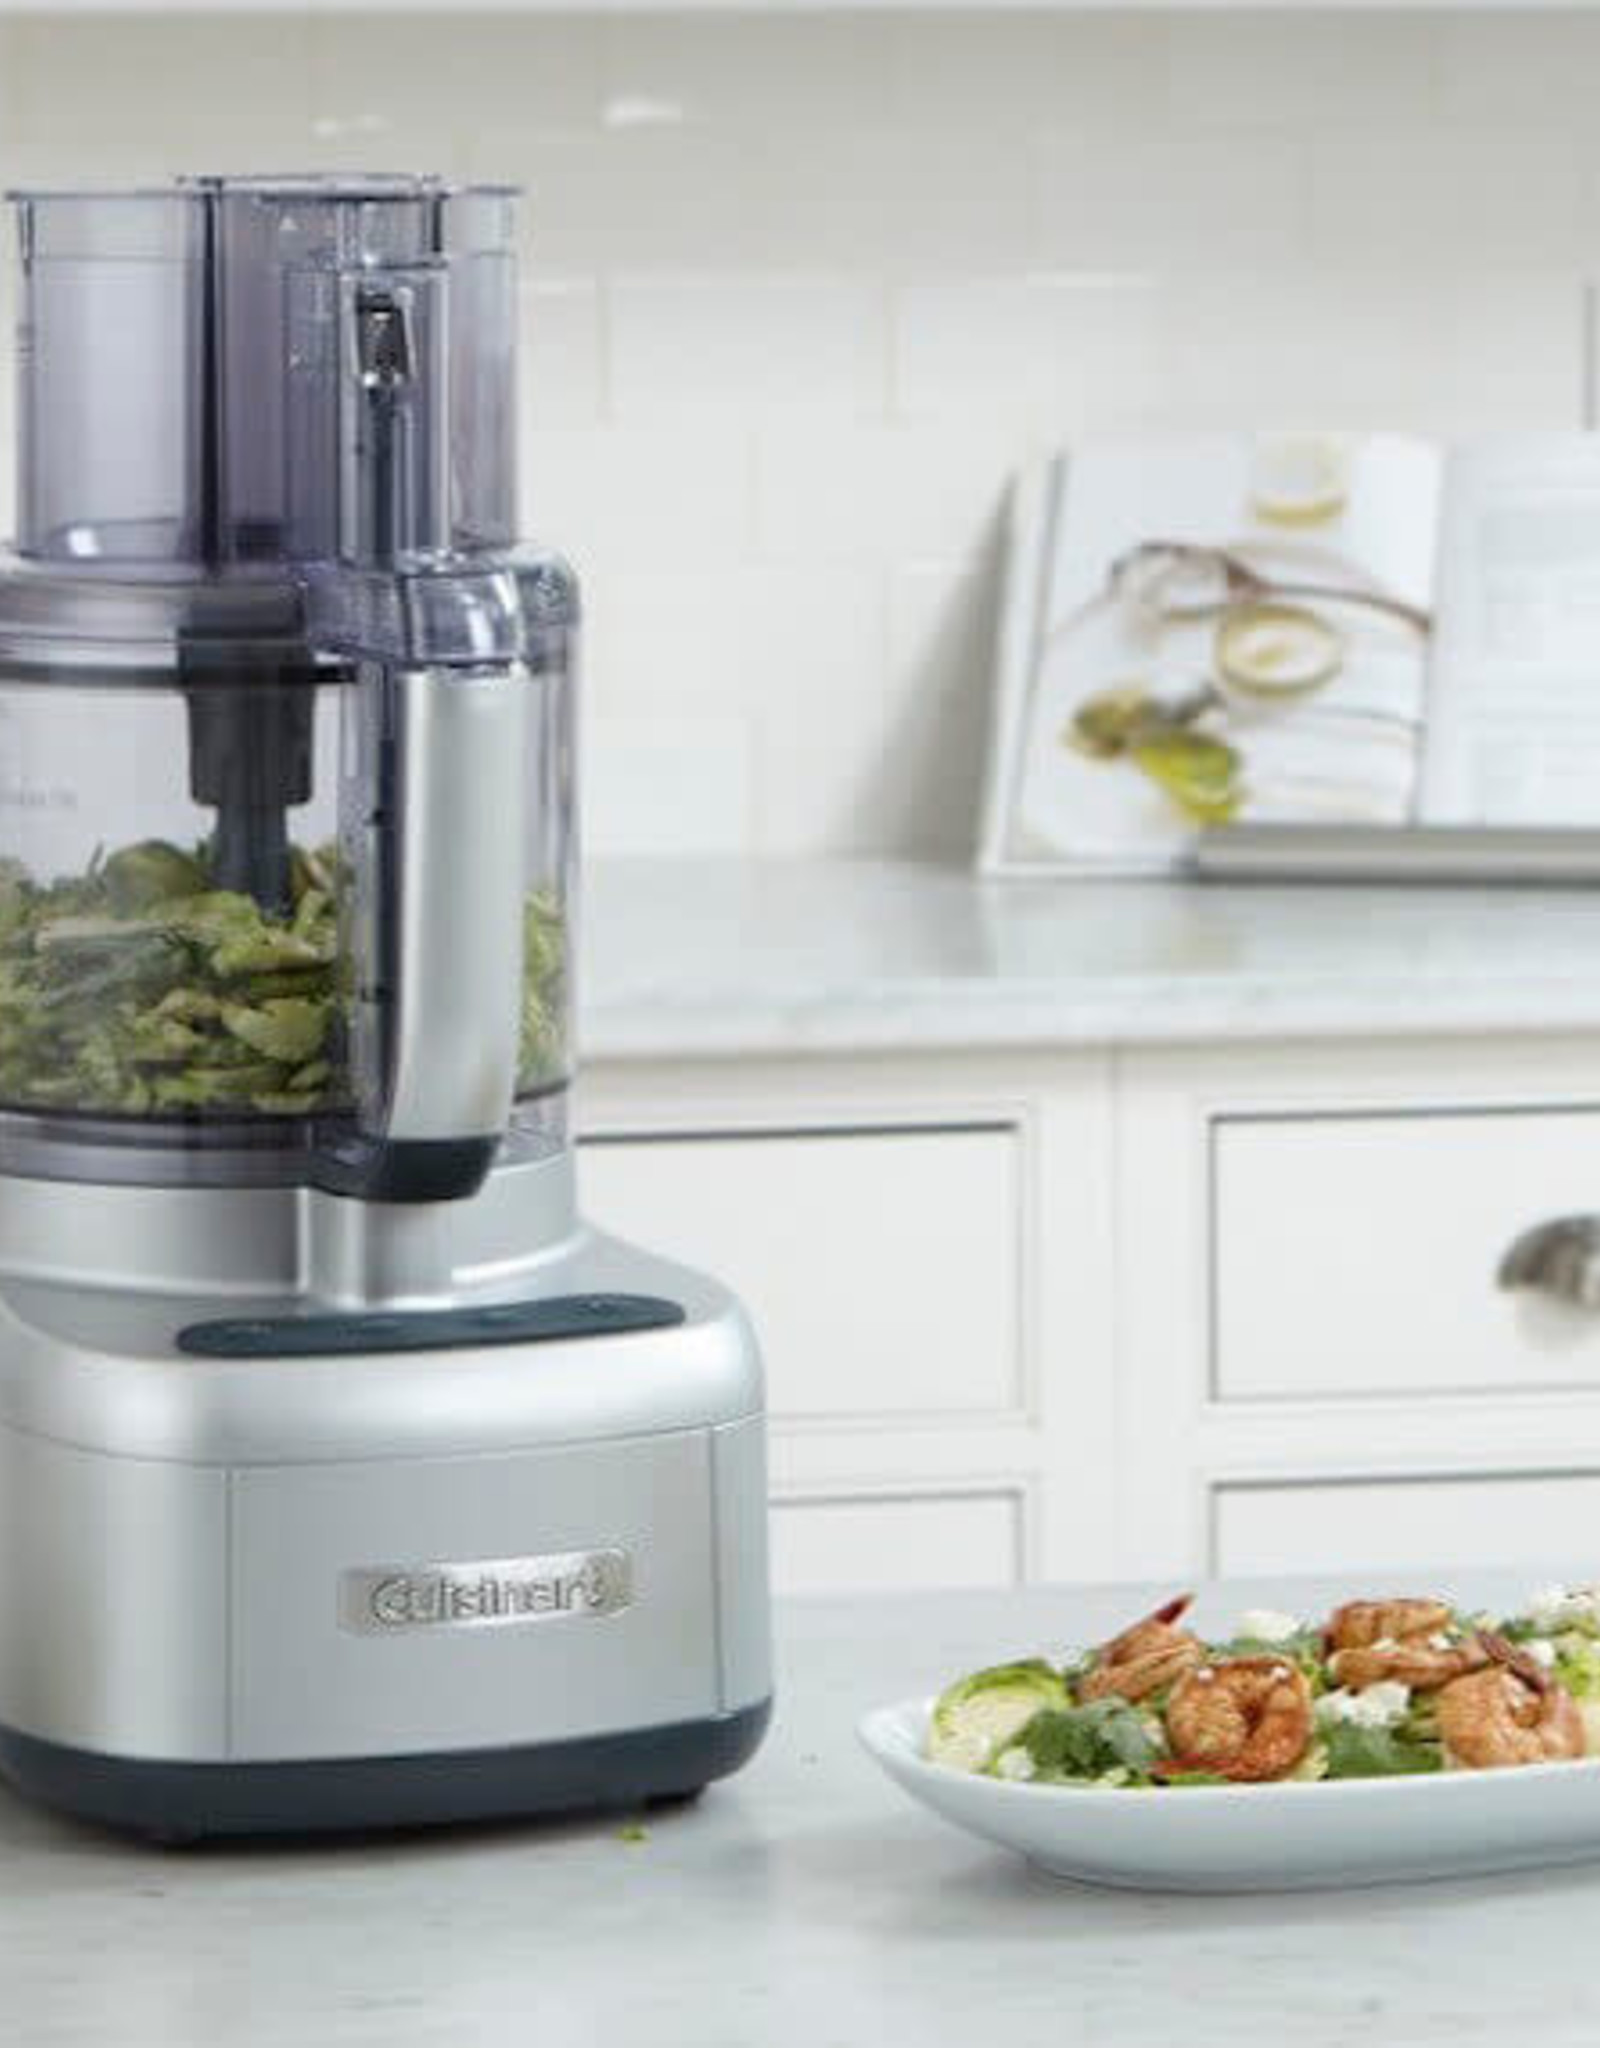 Cuisinart Cuisinart Elemental 11-cup Food Processor, Silver